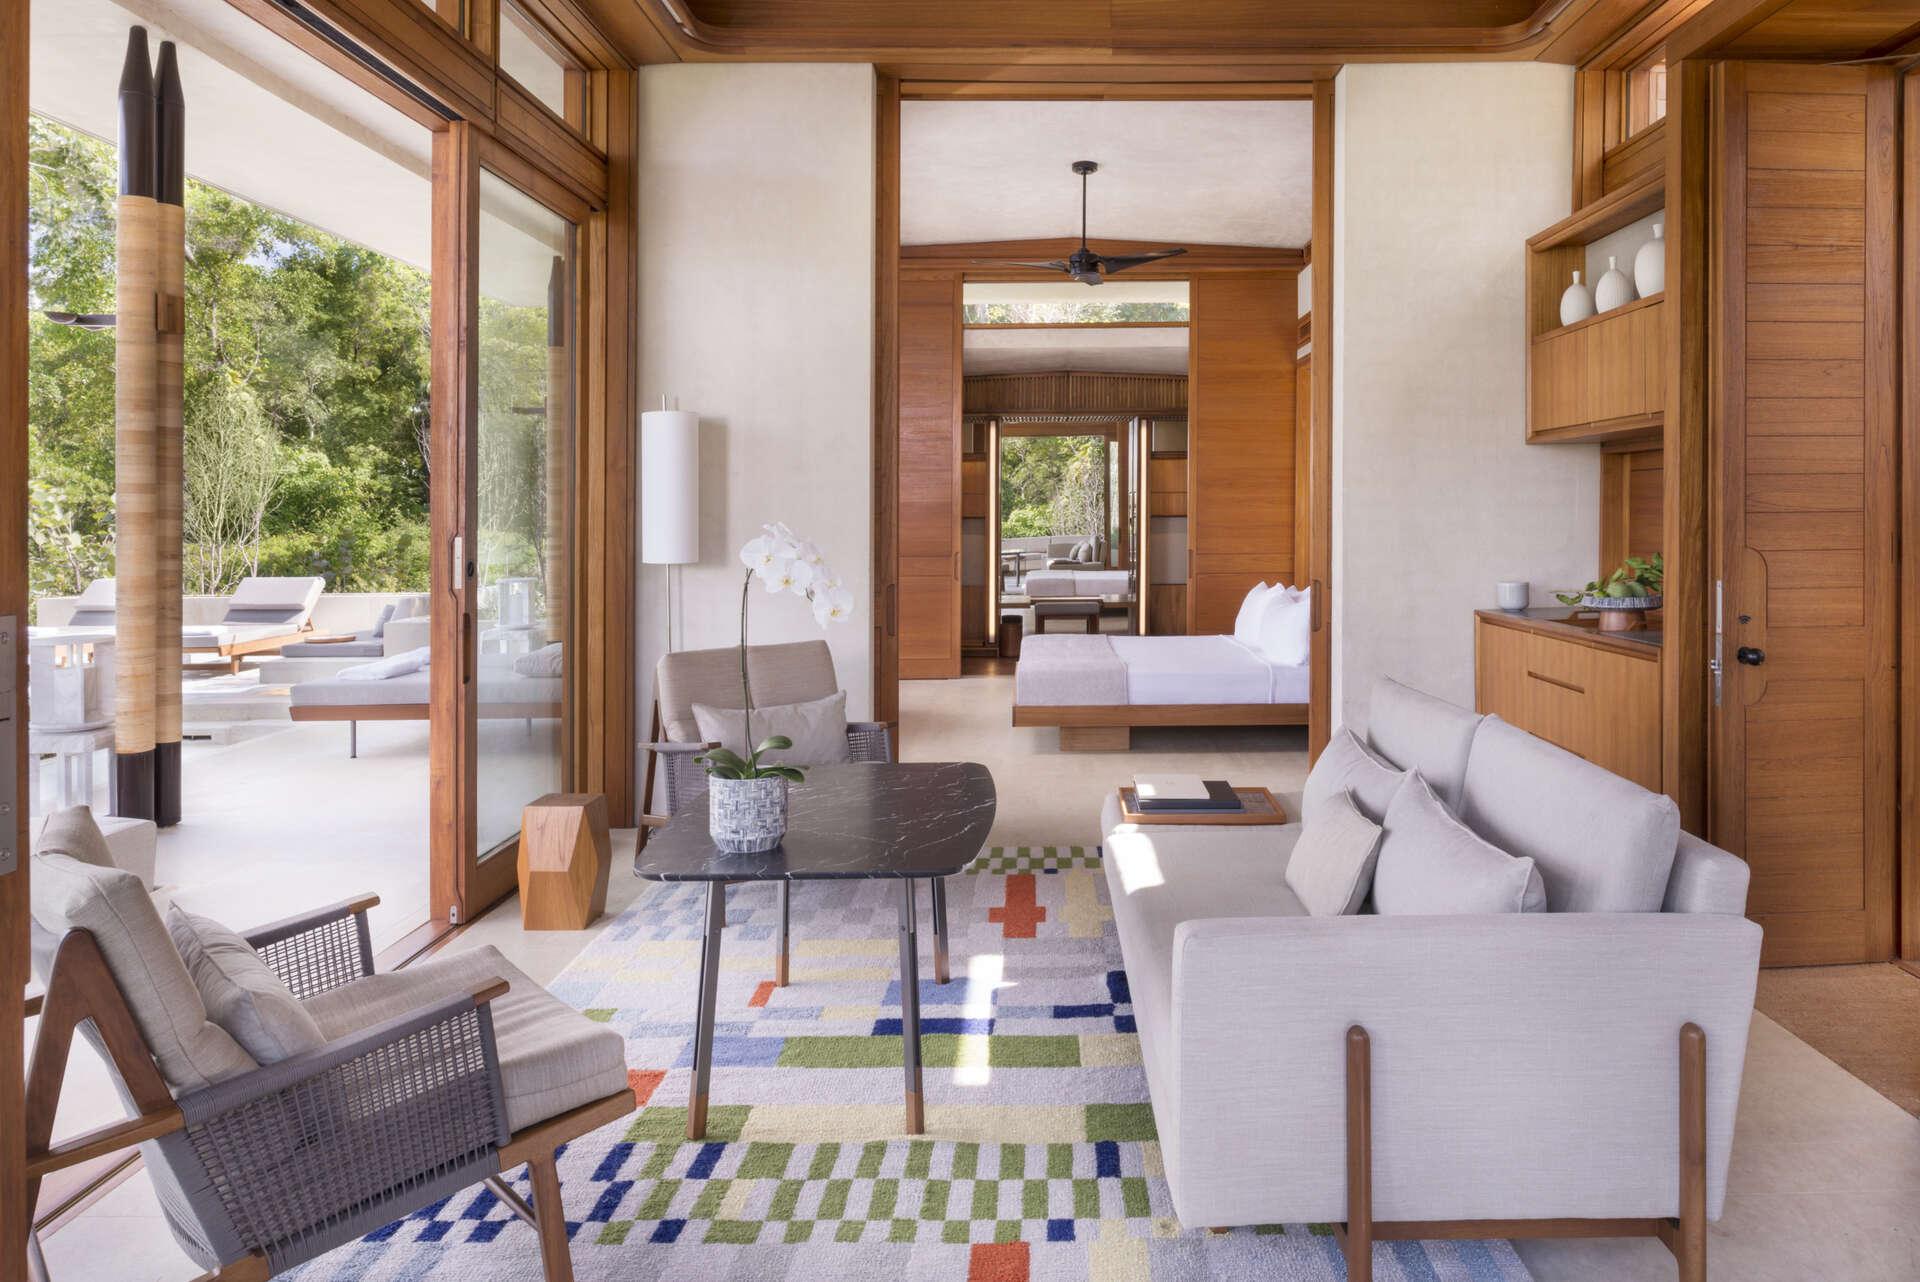 Luxury villa rentals caribbean - Dominican republic - Amanera - Casita - Image 1/17